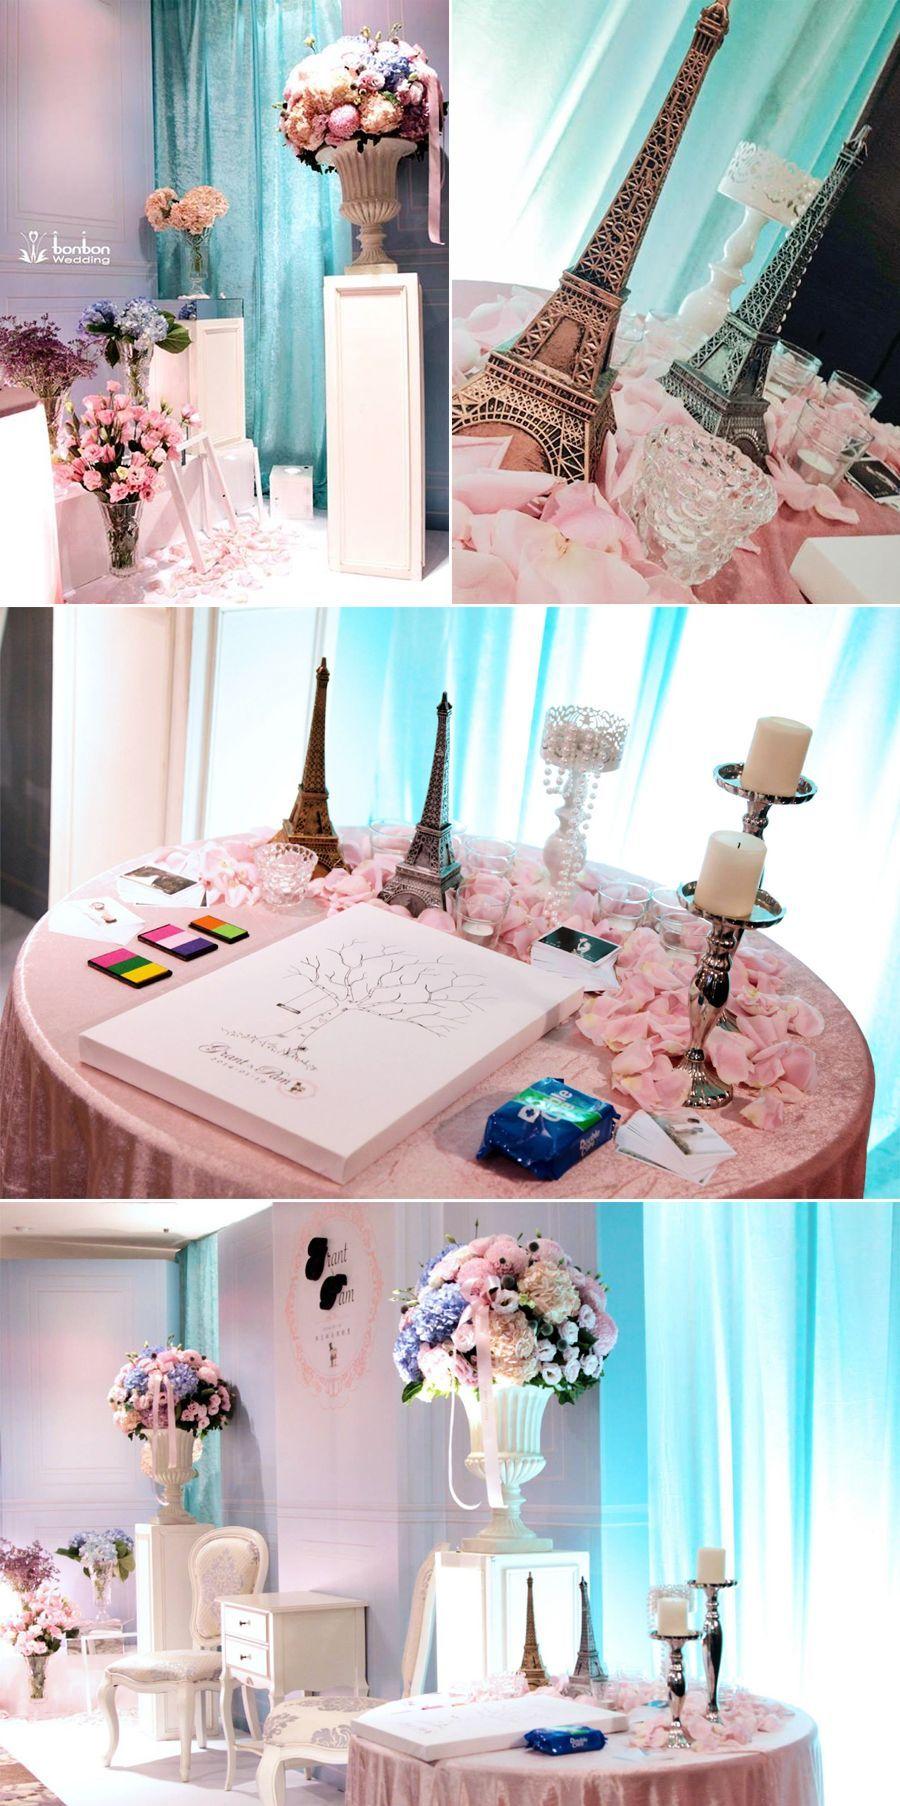 Paris Wedding Theme Ideas Maroon Blue Paris Reception Decor In 2019 Paris Wedding Pari Paris Theme Wedding Paris Themed Wedding Centerpieces Paris Wedding